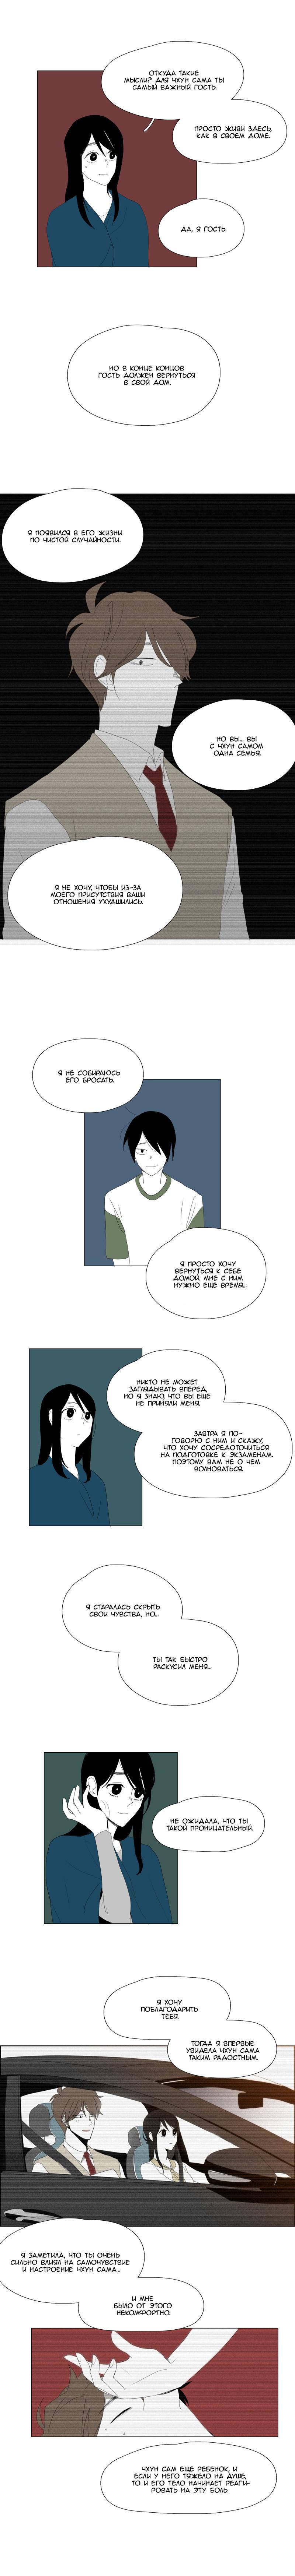 https://r1.ninemanga.com/comics/pic2/33/27873/311923/1477614077921.jpg Page 5